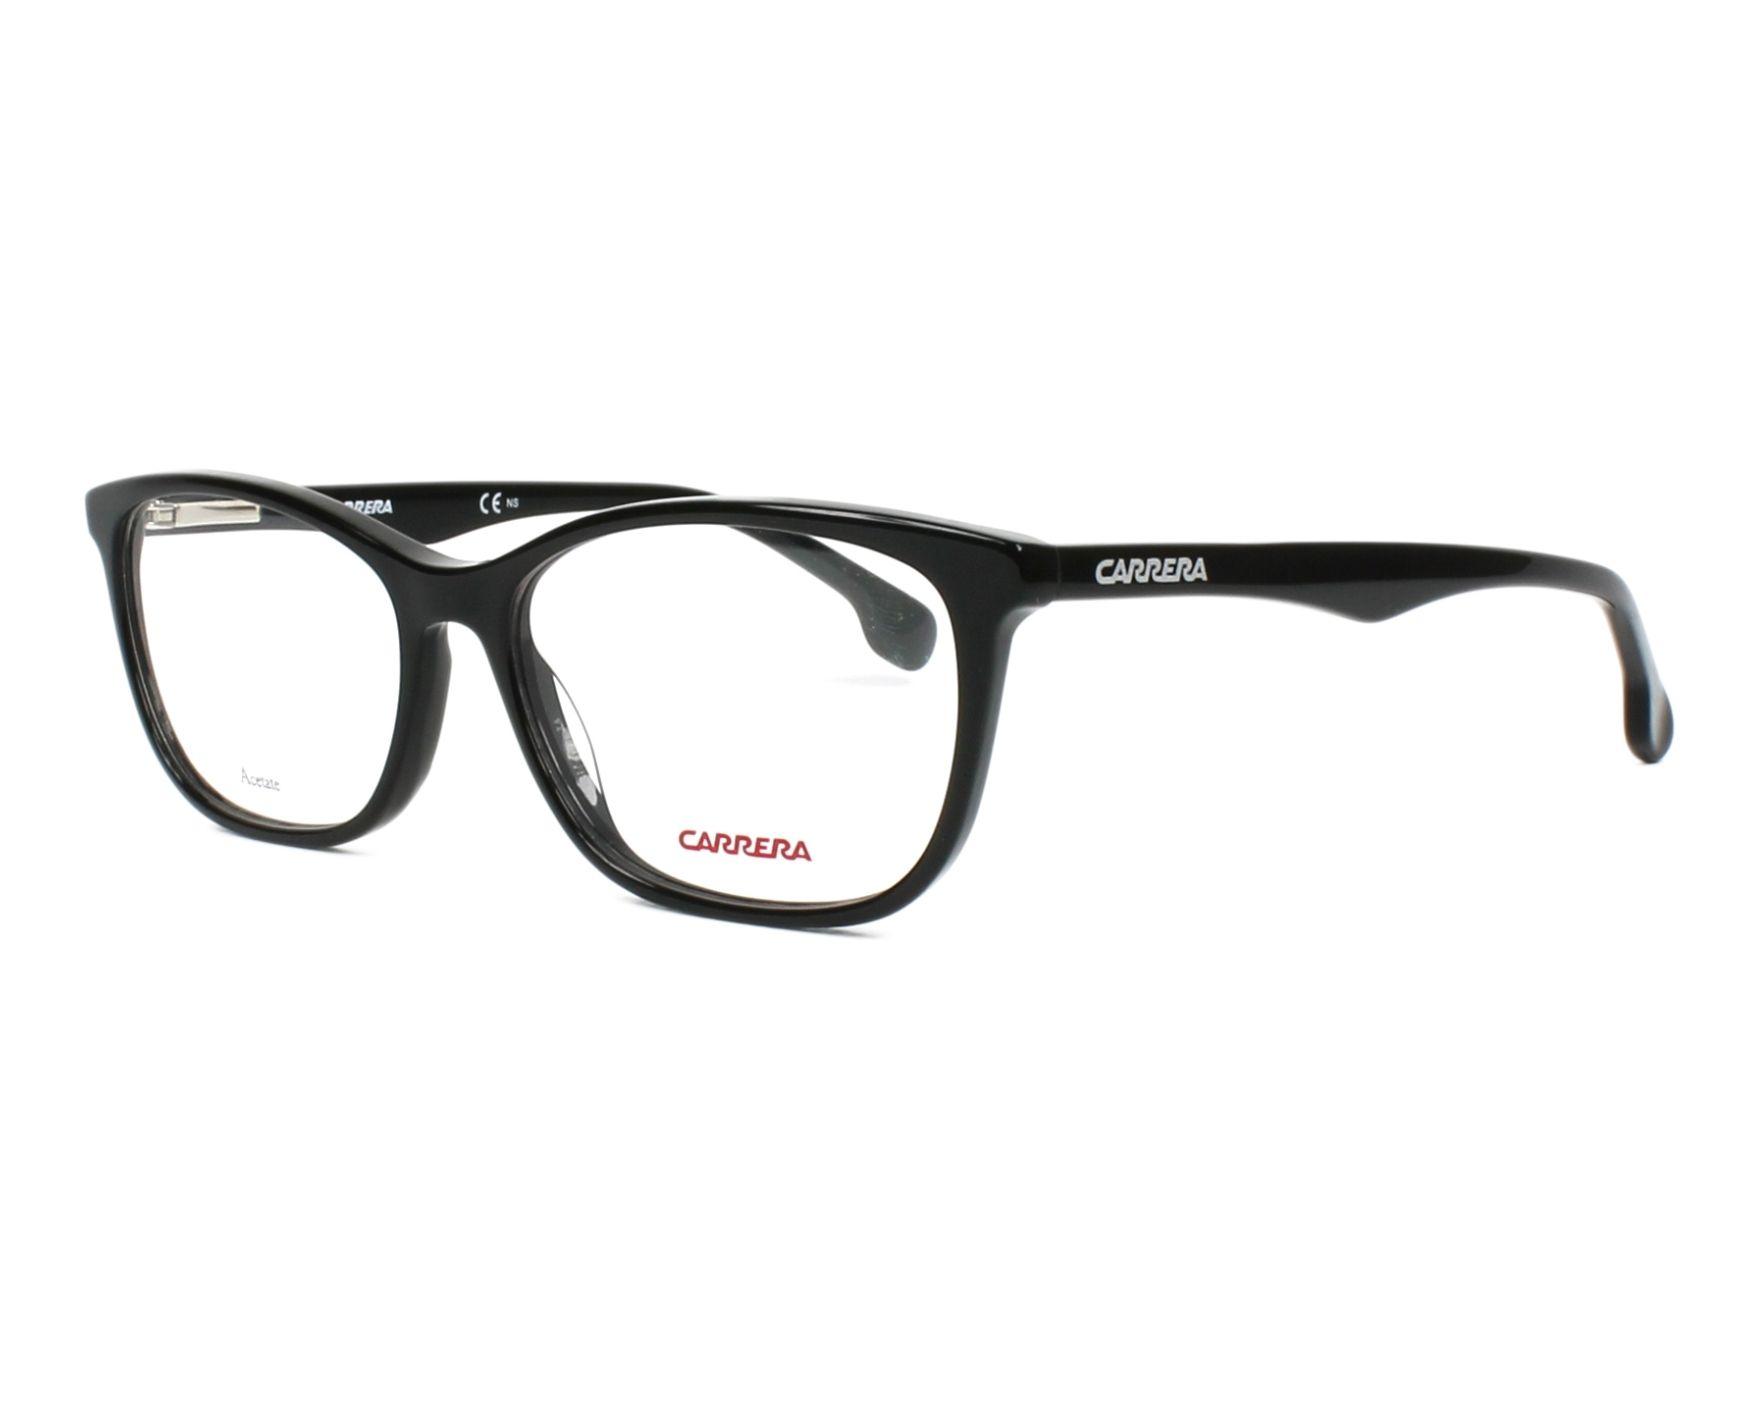 Carrera Eyewear Kinderbrillen Brille » CARRERINO 64« schwarz 807 ...